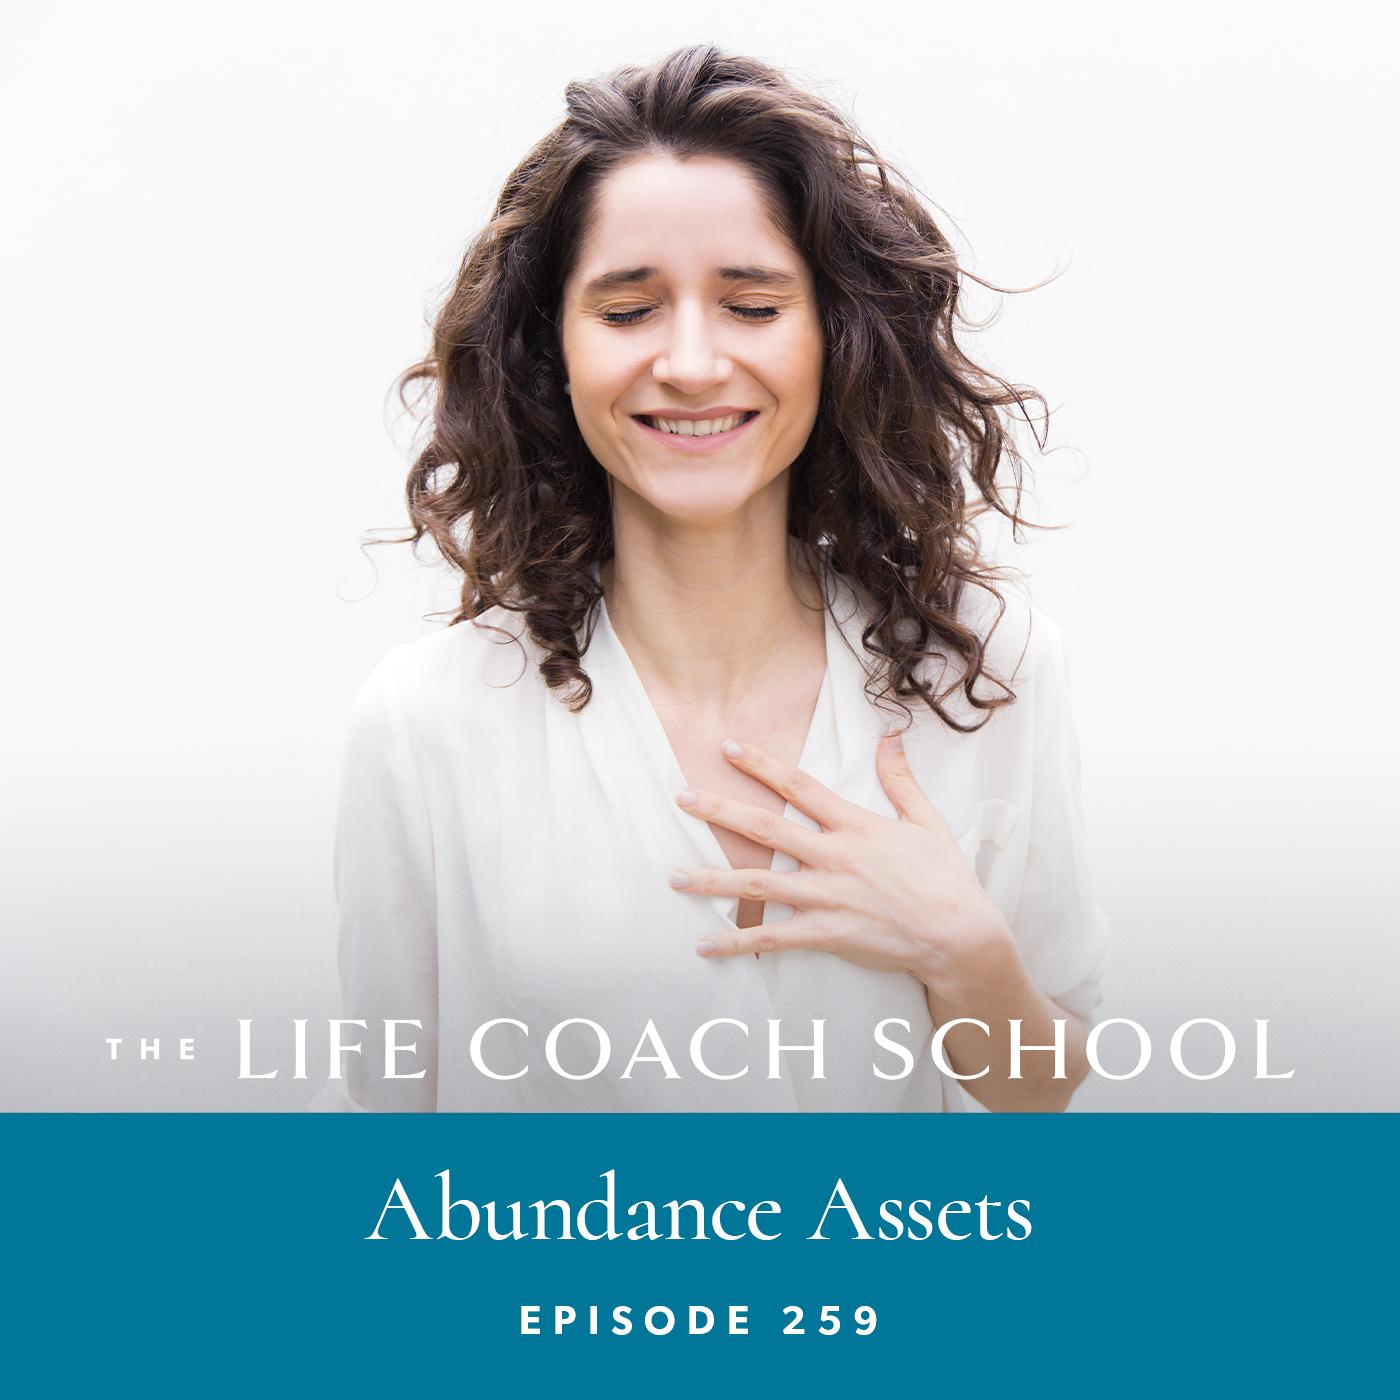 The Life Coach School Podcast with Brooke Castillo | Episode 259 | Abundance Assets